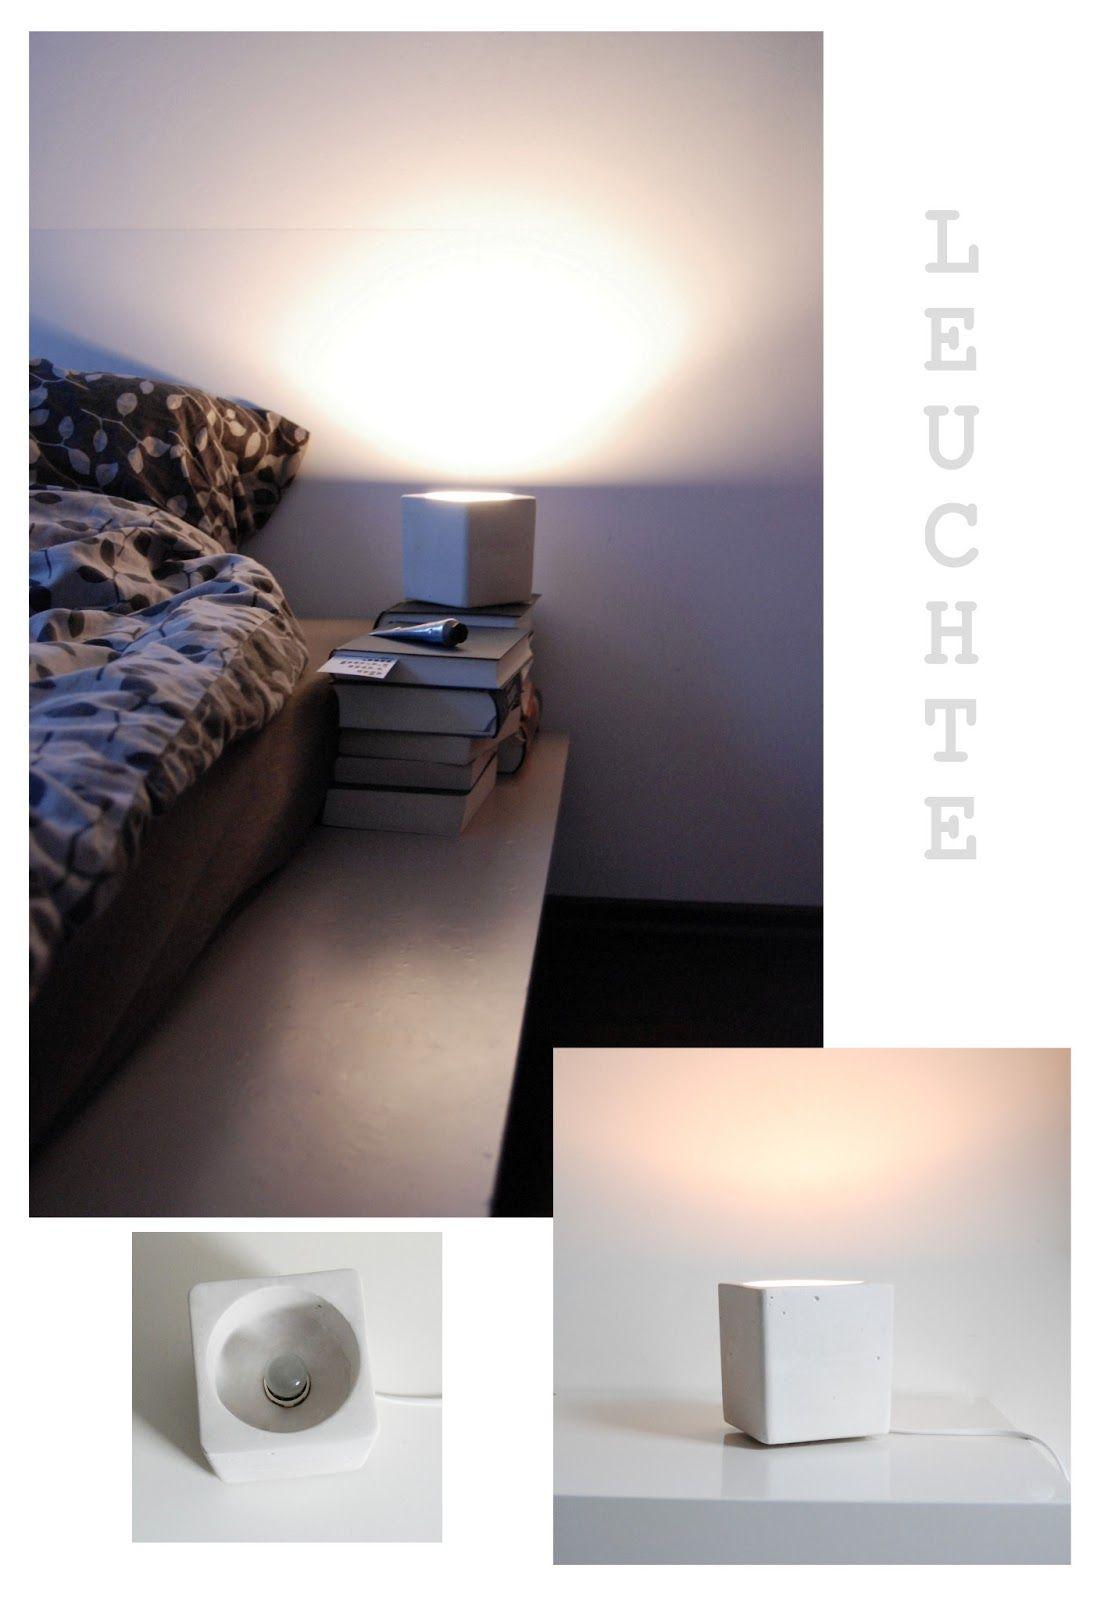 3 plastikgef e tupper quasi eine au enform darin eine. Black Bedroom Furniture Sets. Home Design Ideas